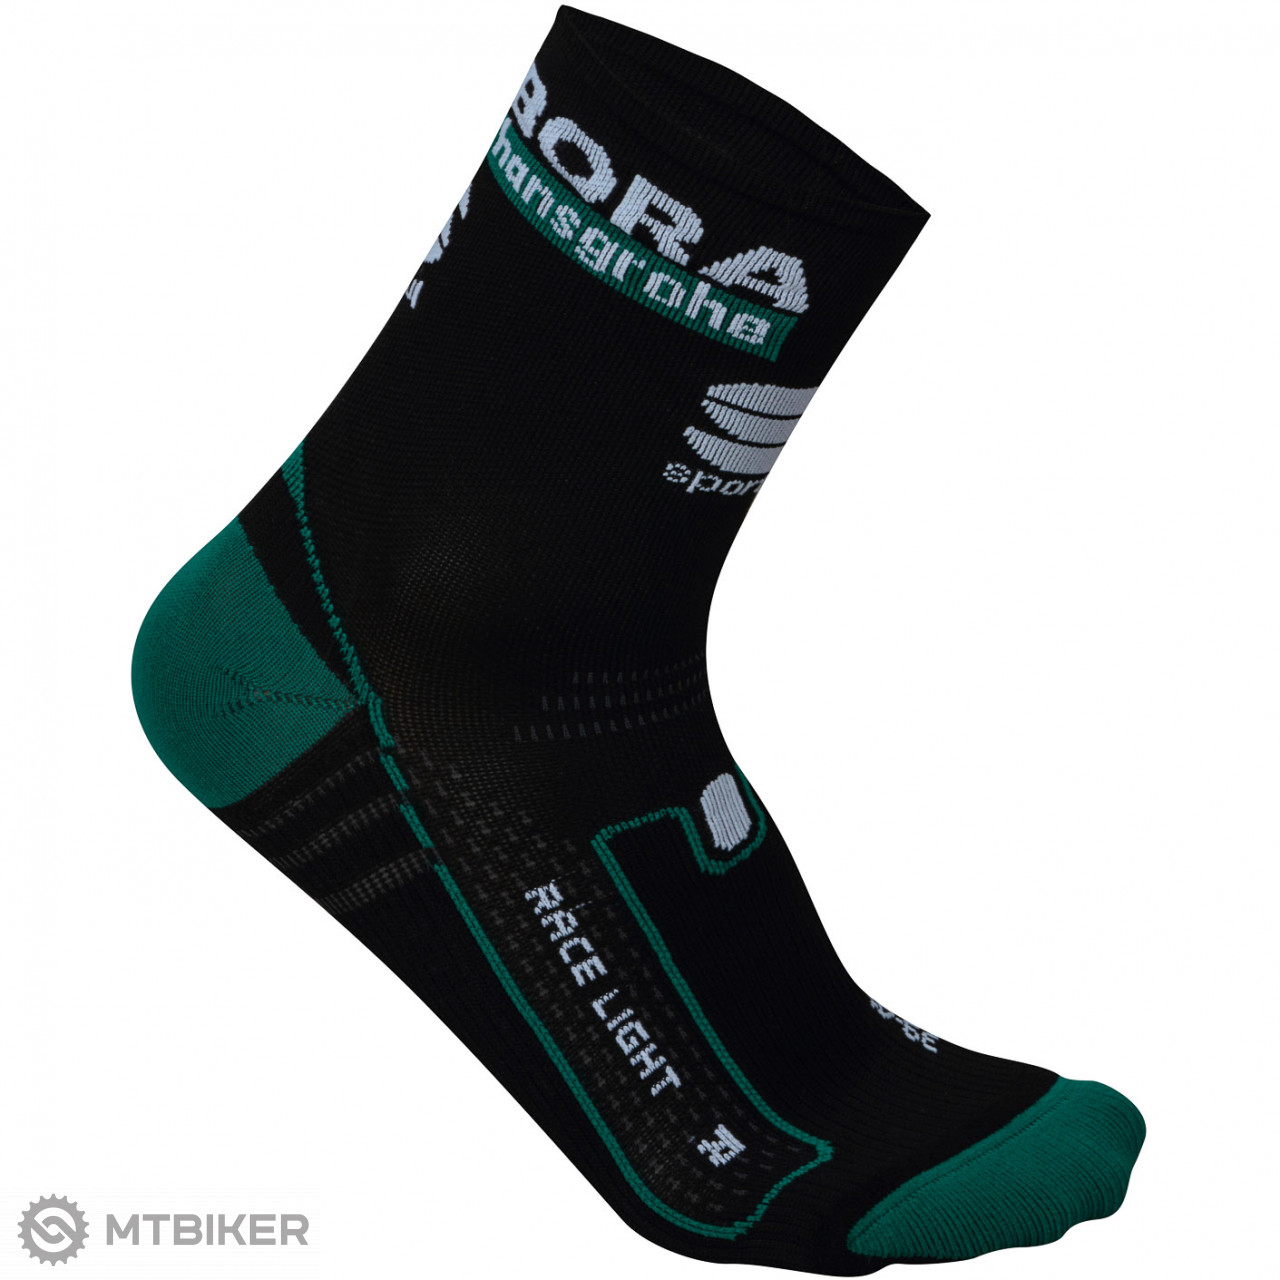 5cf54d3faa0e Sportful BORA HANSGROHE ponožky čierne - MTBIKER Shop